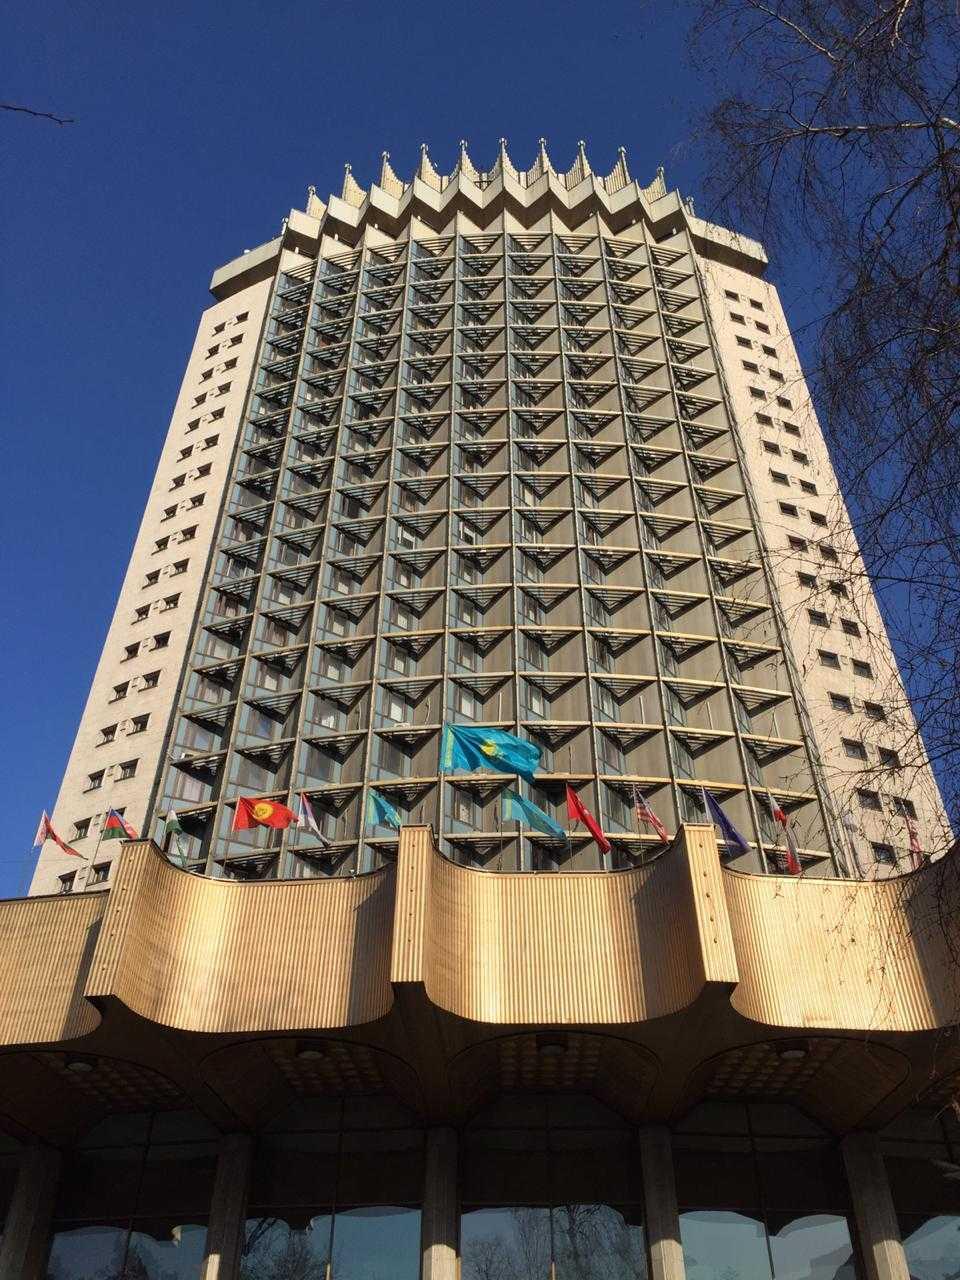 grand hotel almaty Kazakhstan Architecture